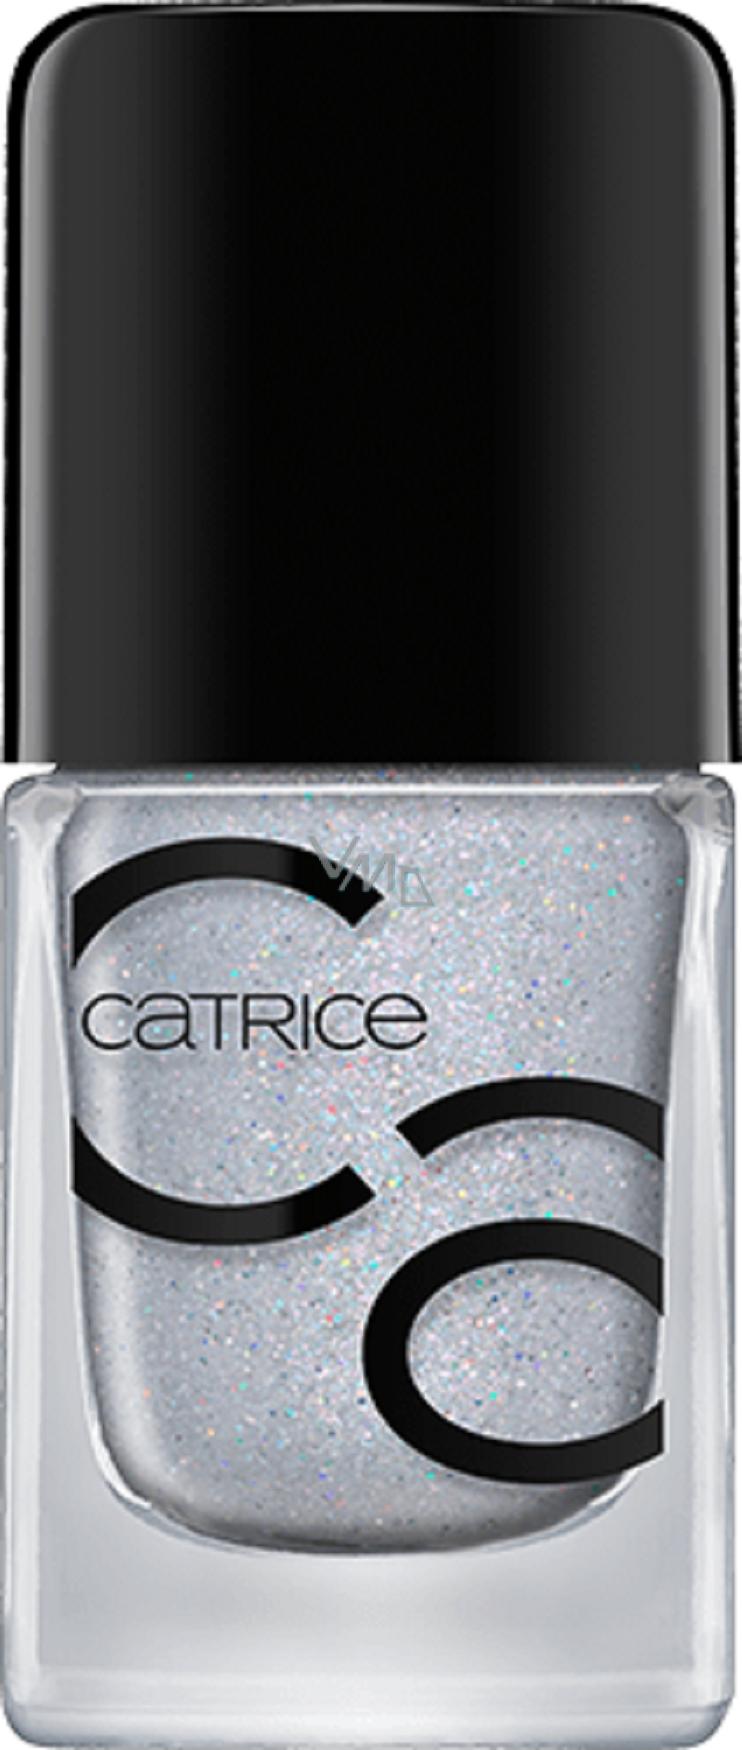 Catrice Iconails Gel Lacque Nail Polish 59 Keep Me Im Cute 10 5 Ml Vmd Parfumerie Drogerie